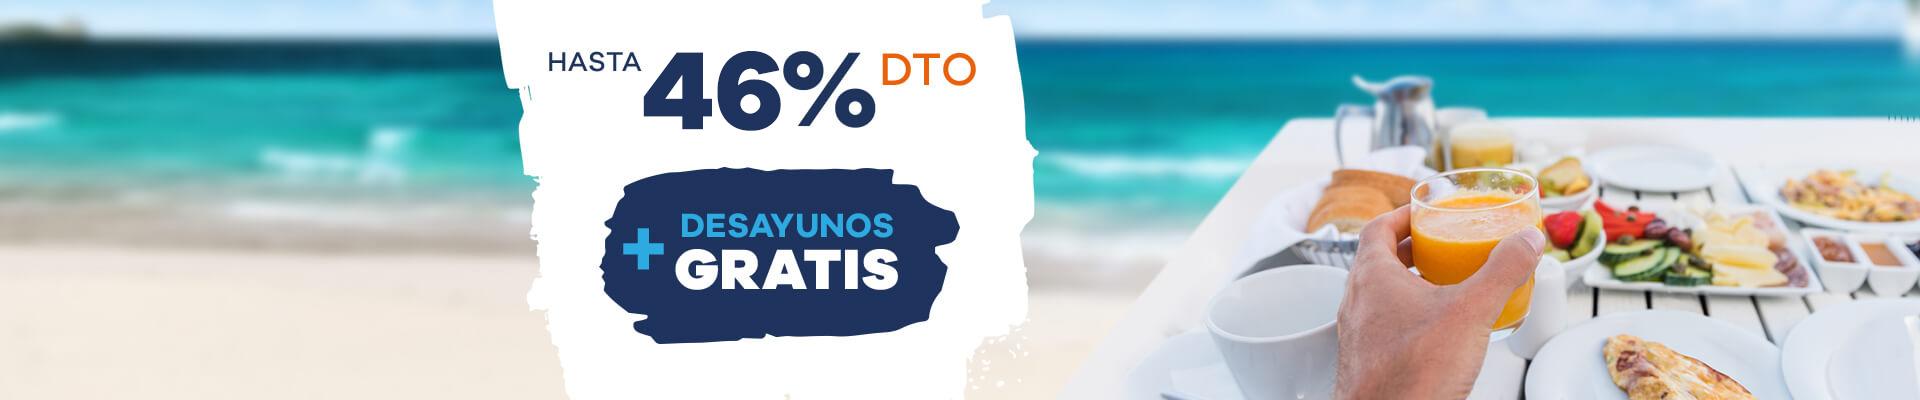 DESAYUNOS GRATIS